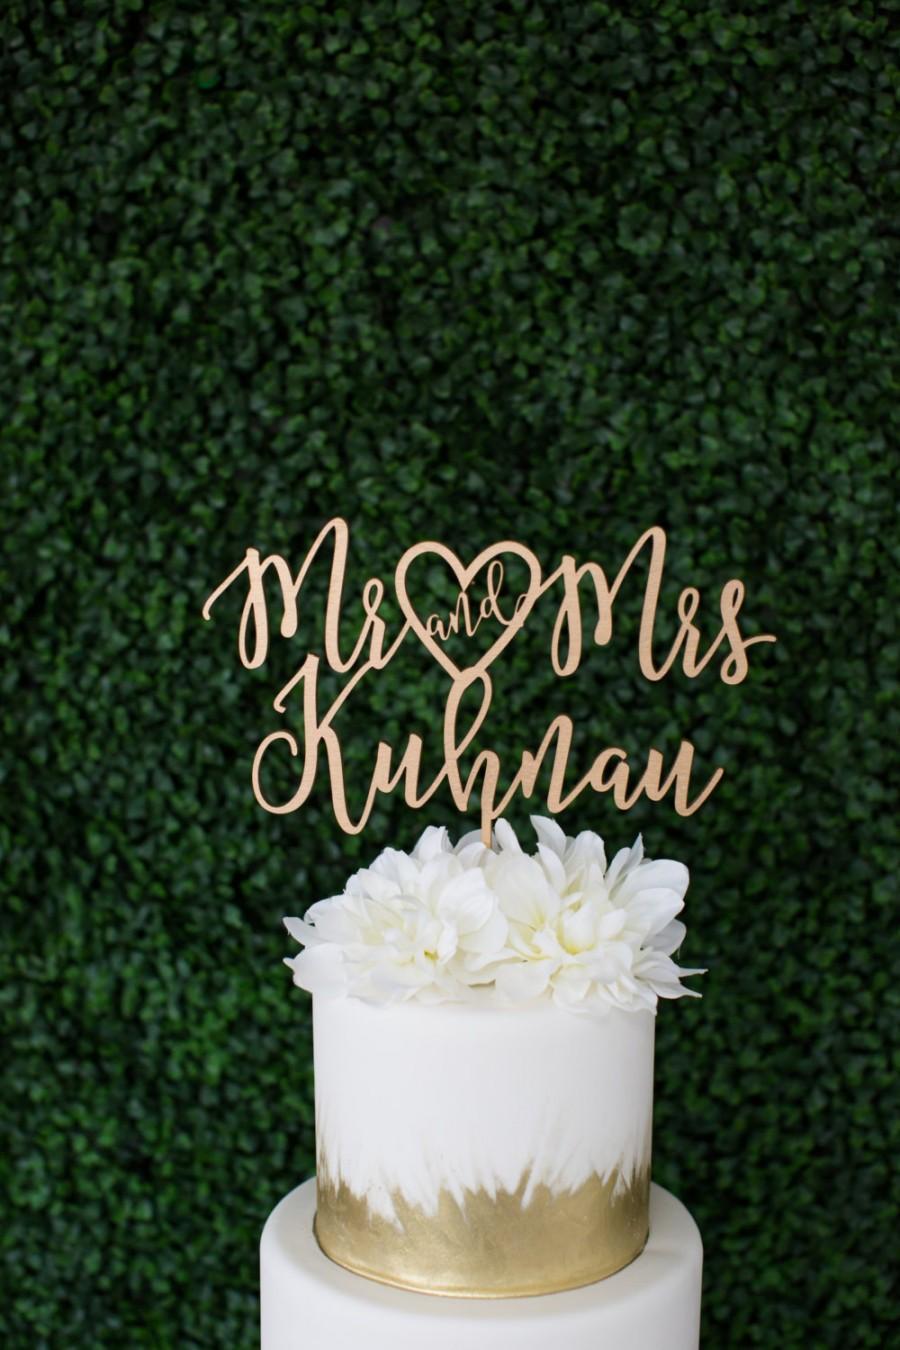 Свадьба - Laser Cut Heart Mr and Mrs Wedding Cake Topper - (ONE) Personalized Wedding Cake Topper - Modern Cake Decoration Brush Lettering Gold Topper